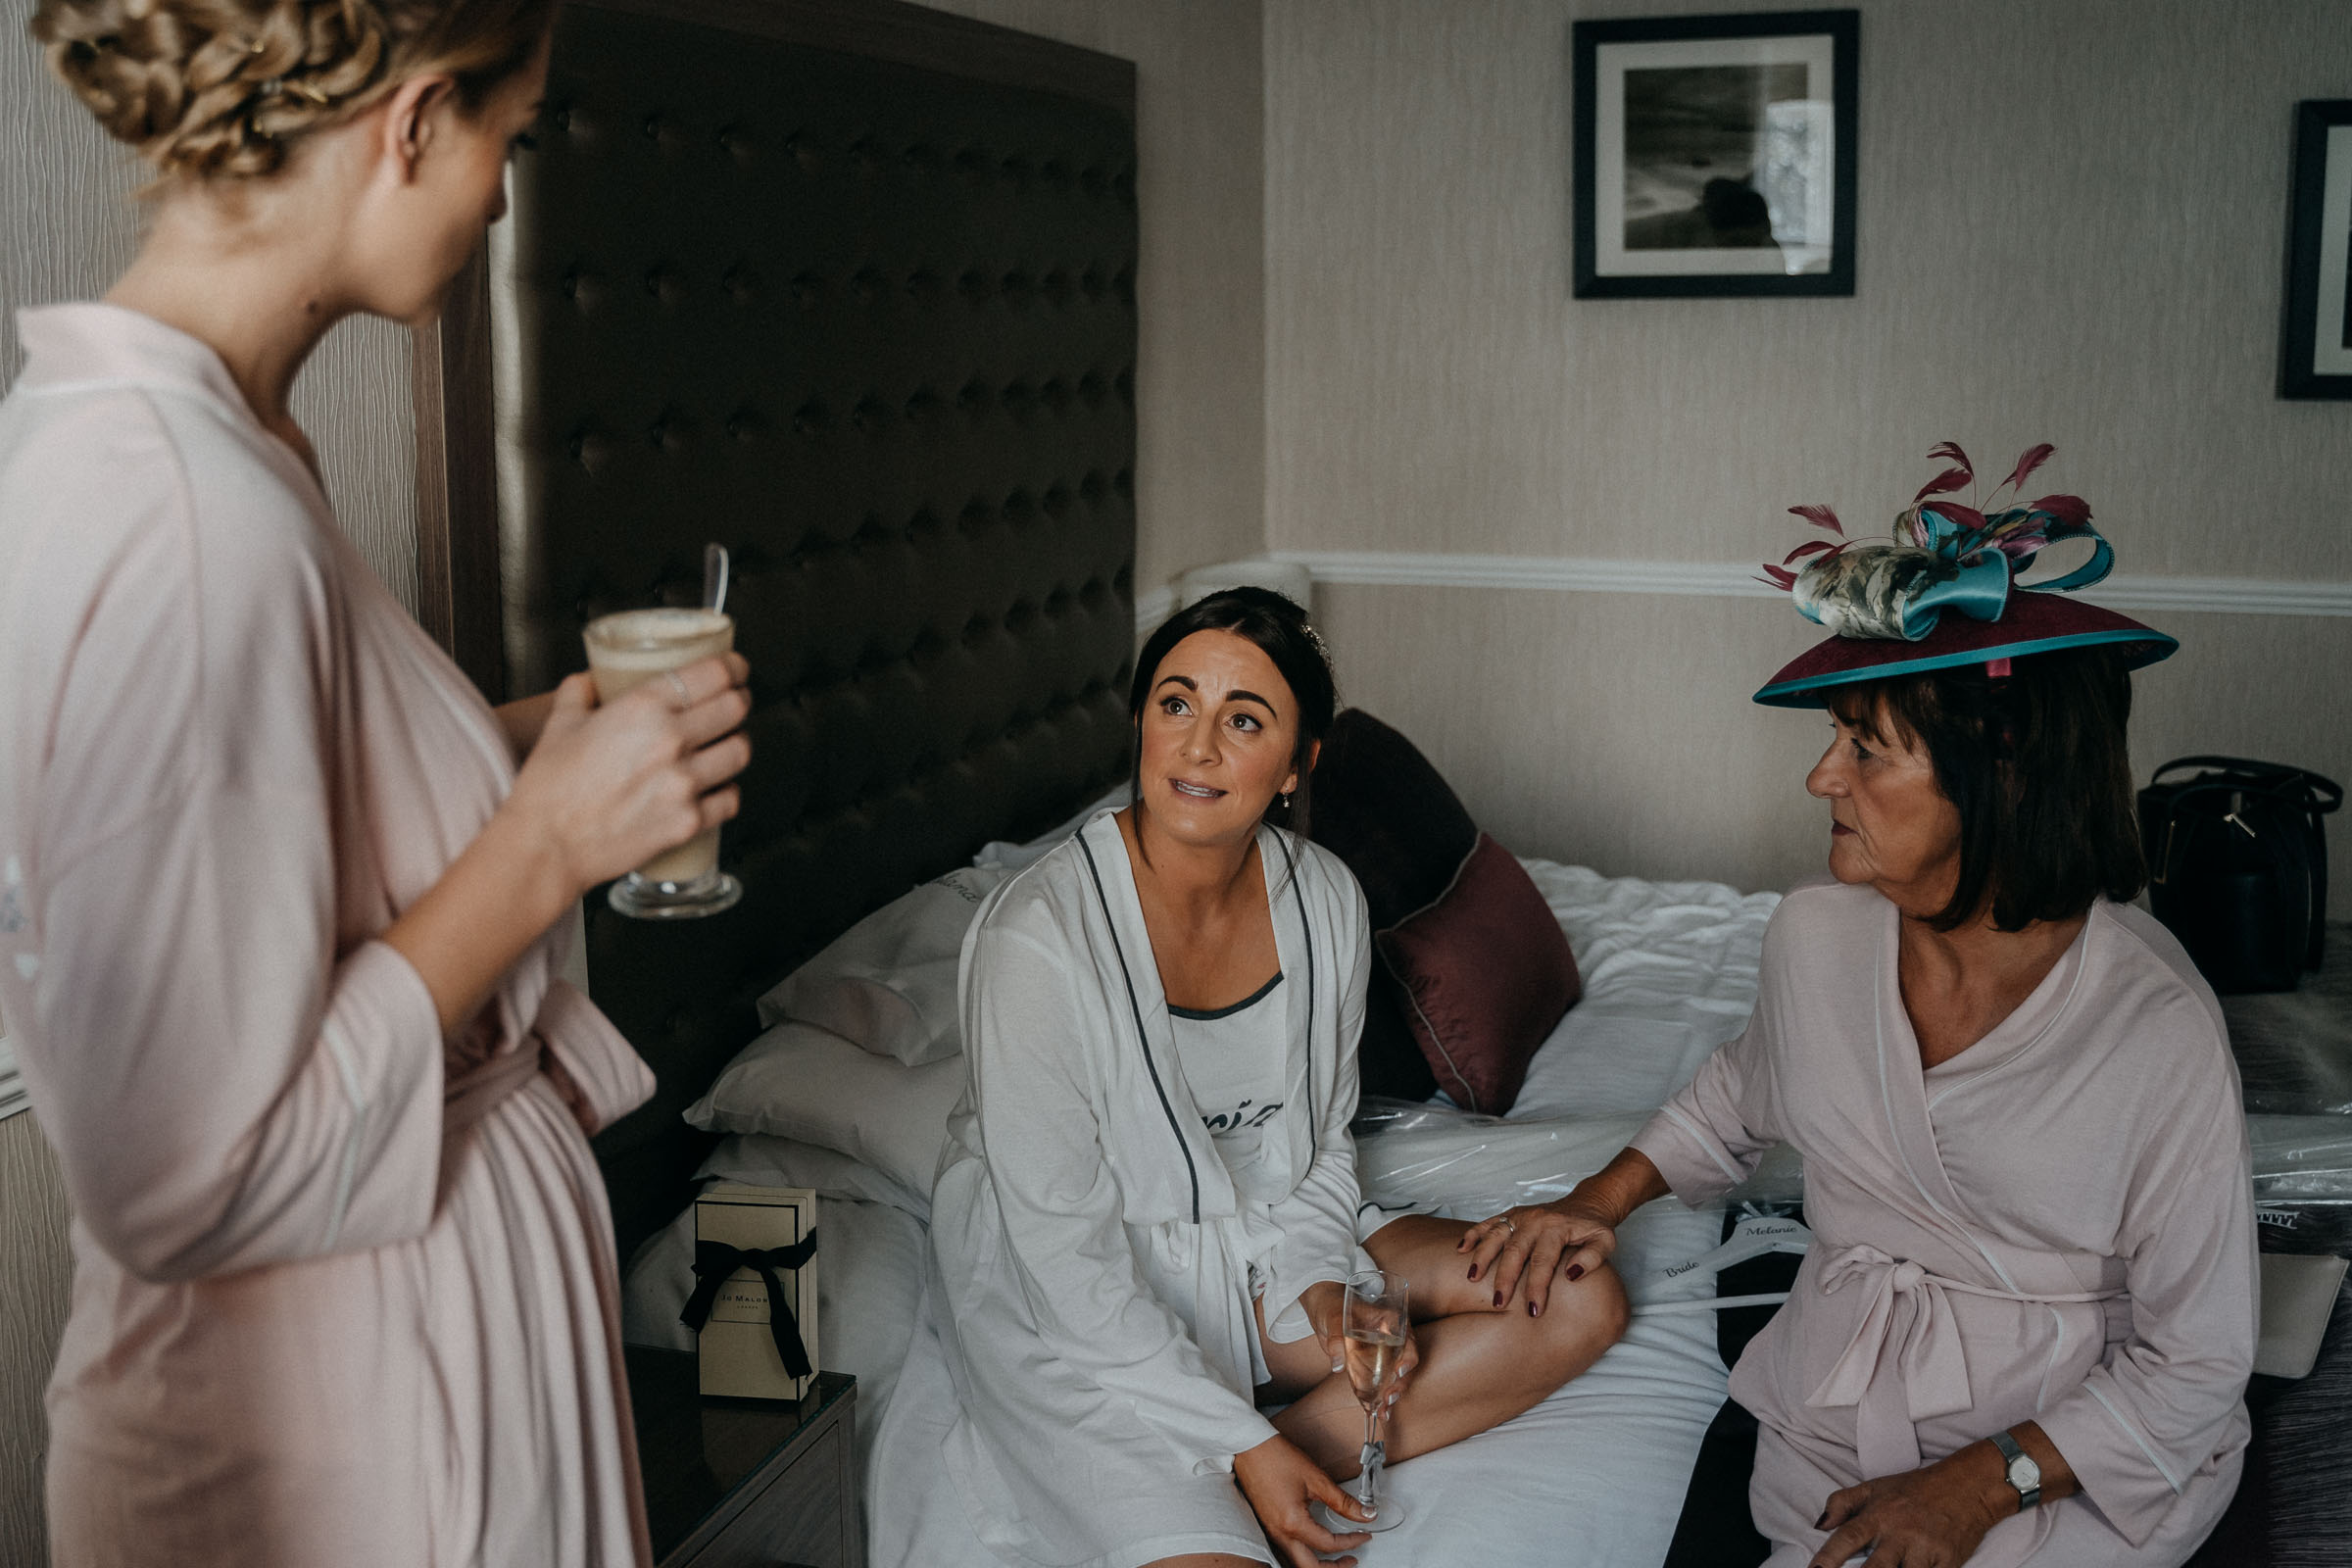 brisbane-house-hotel-wedding-largs-dearly-photography (19 of 94).jpg